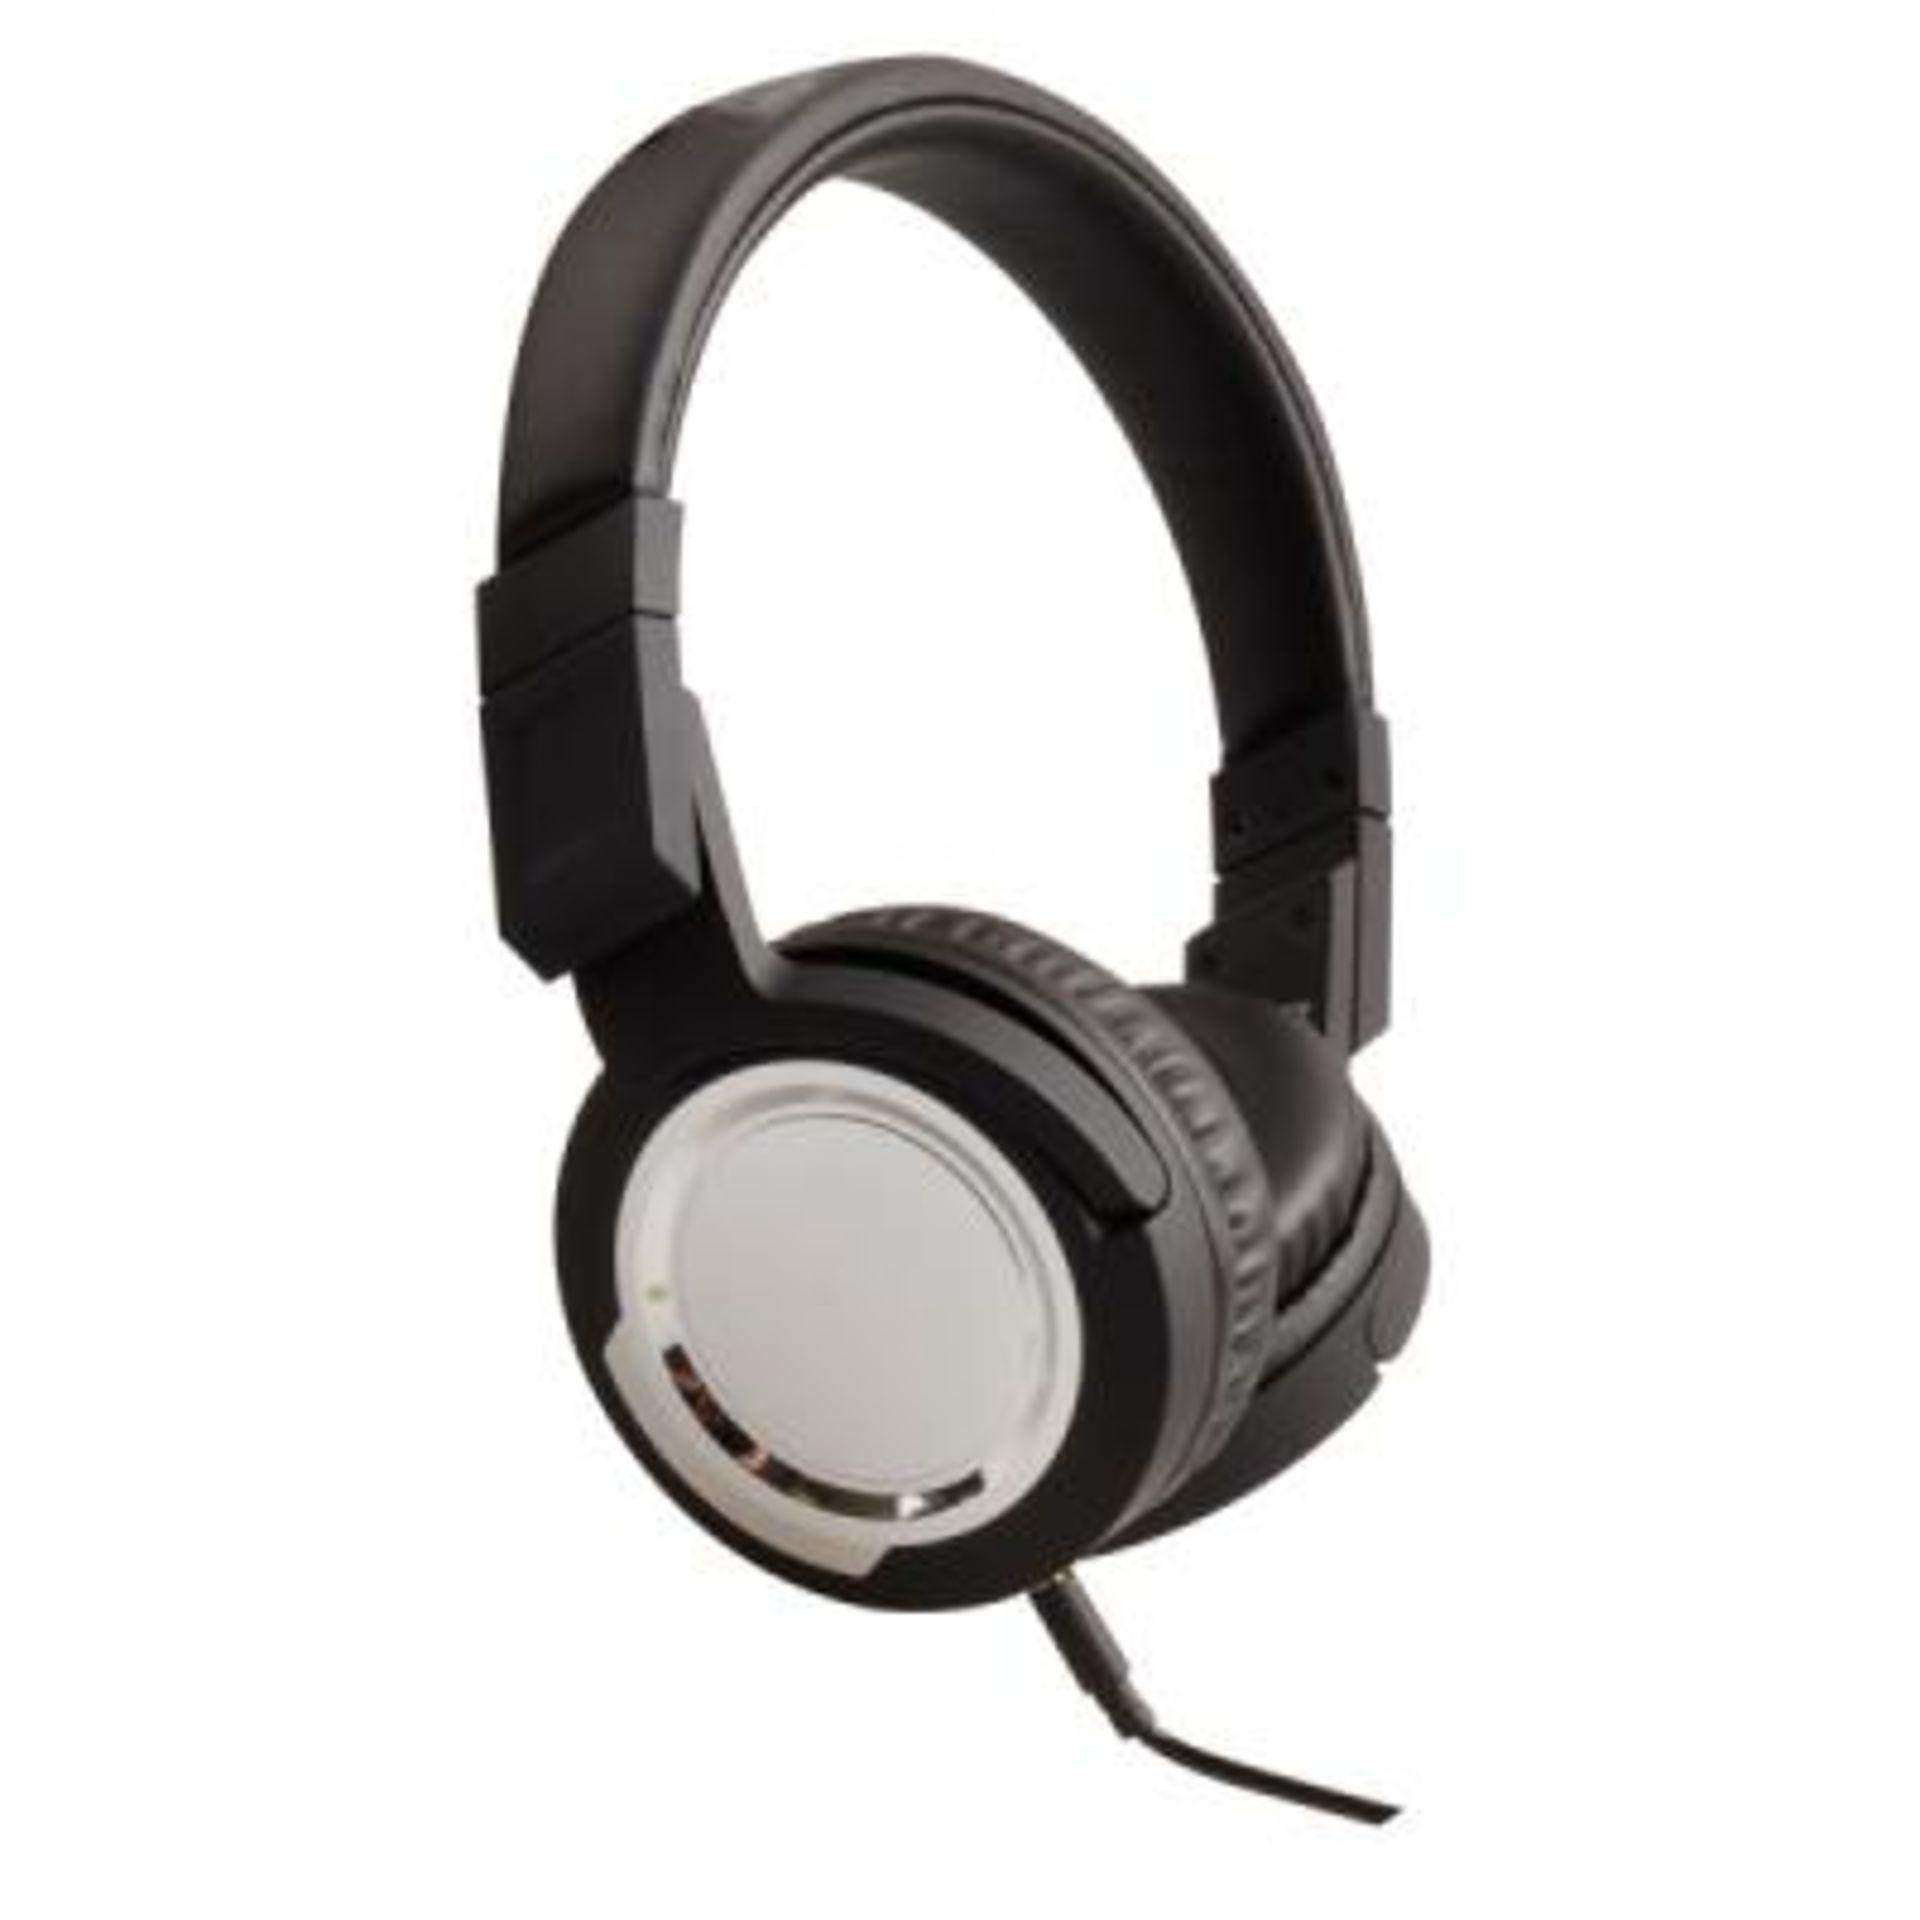 Lot 50084 - V Brand New On-Earz DJ Headset - High Definition - Crazy Bass & Crystal Clear Sound - Rotating Ear